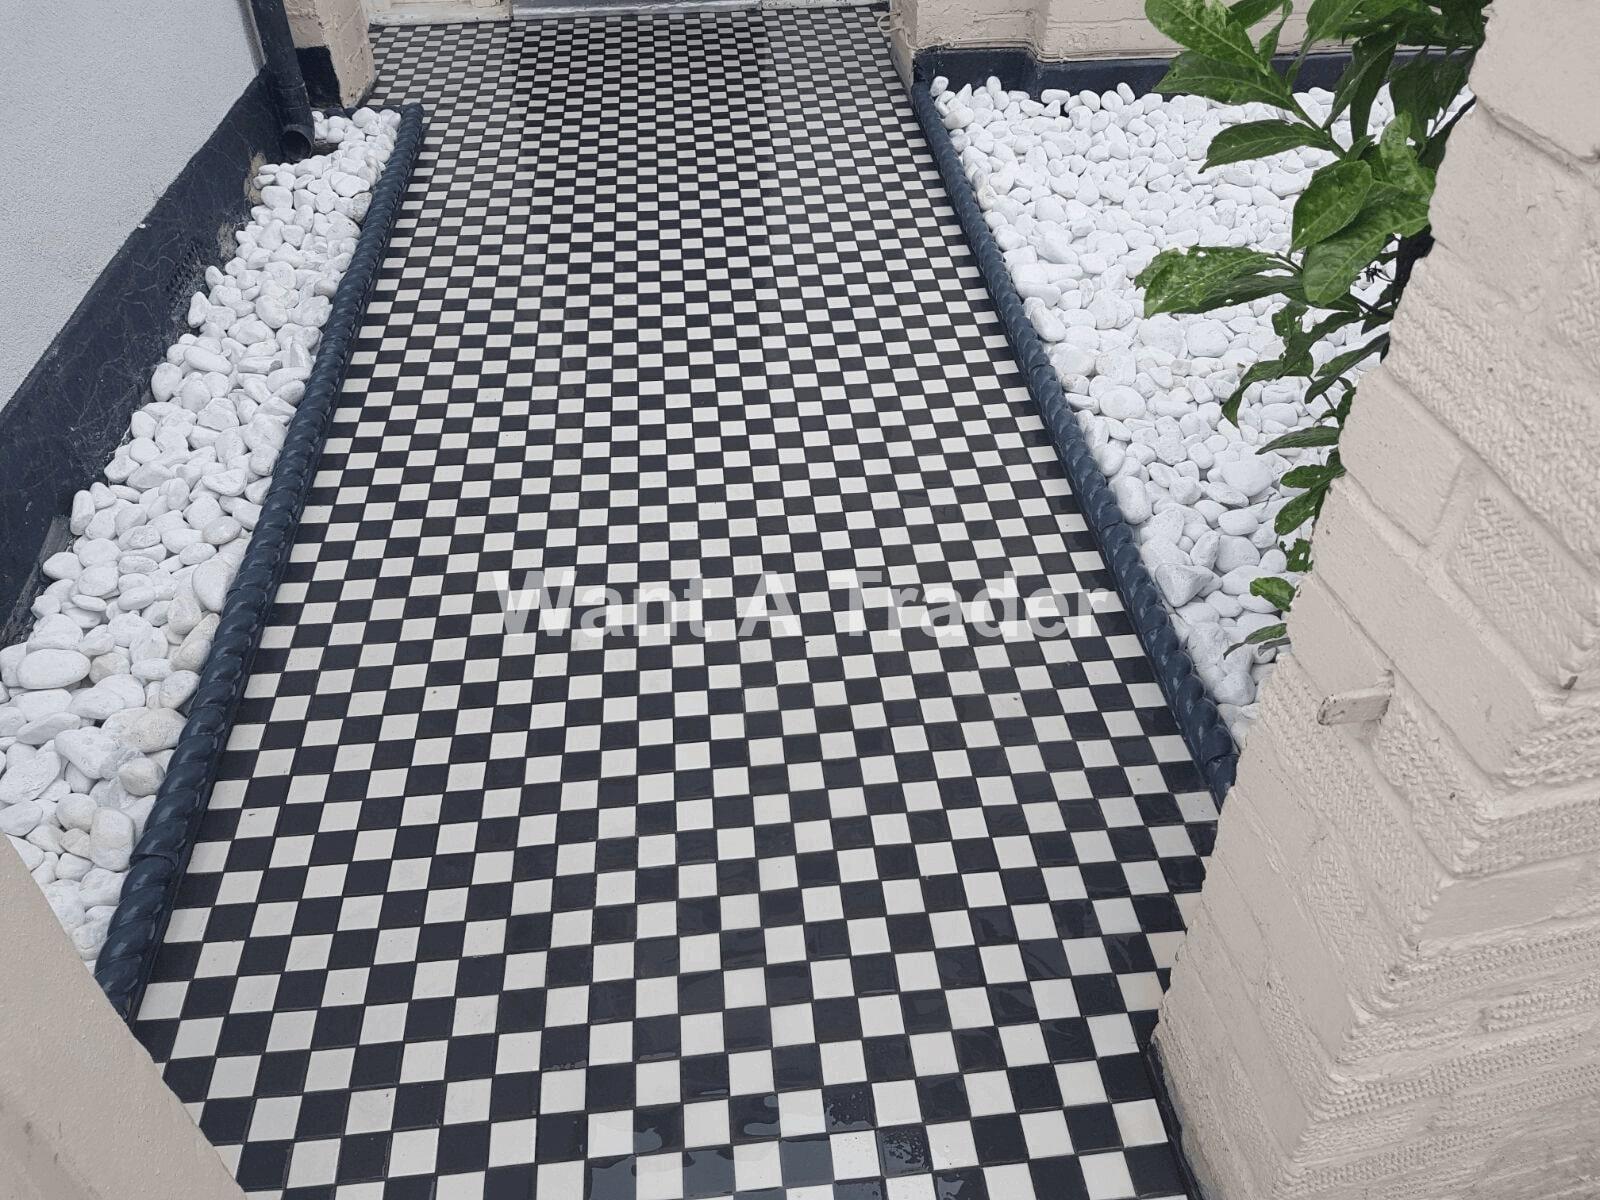 Garden Tiling Company Hayes UB3